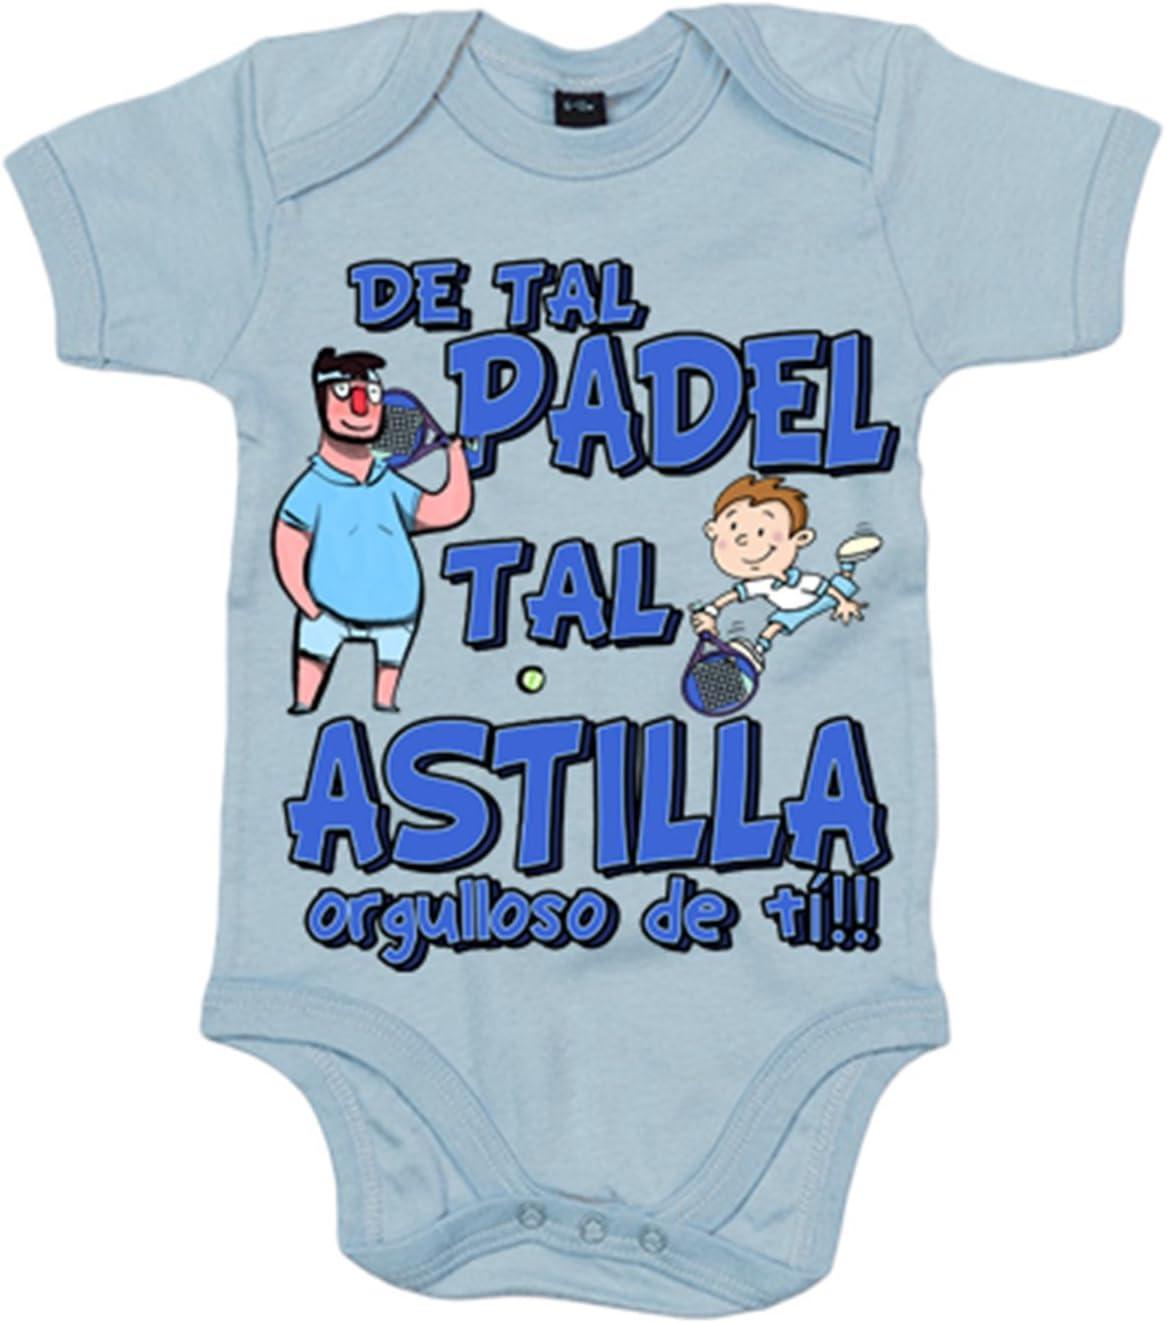 Body bebé padre y niño de tal padel tal astilla orgulloso de ti - Celeste, 6-12 meses